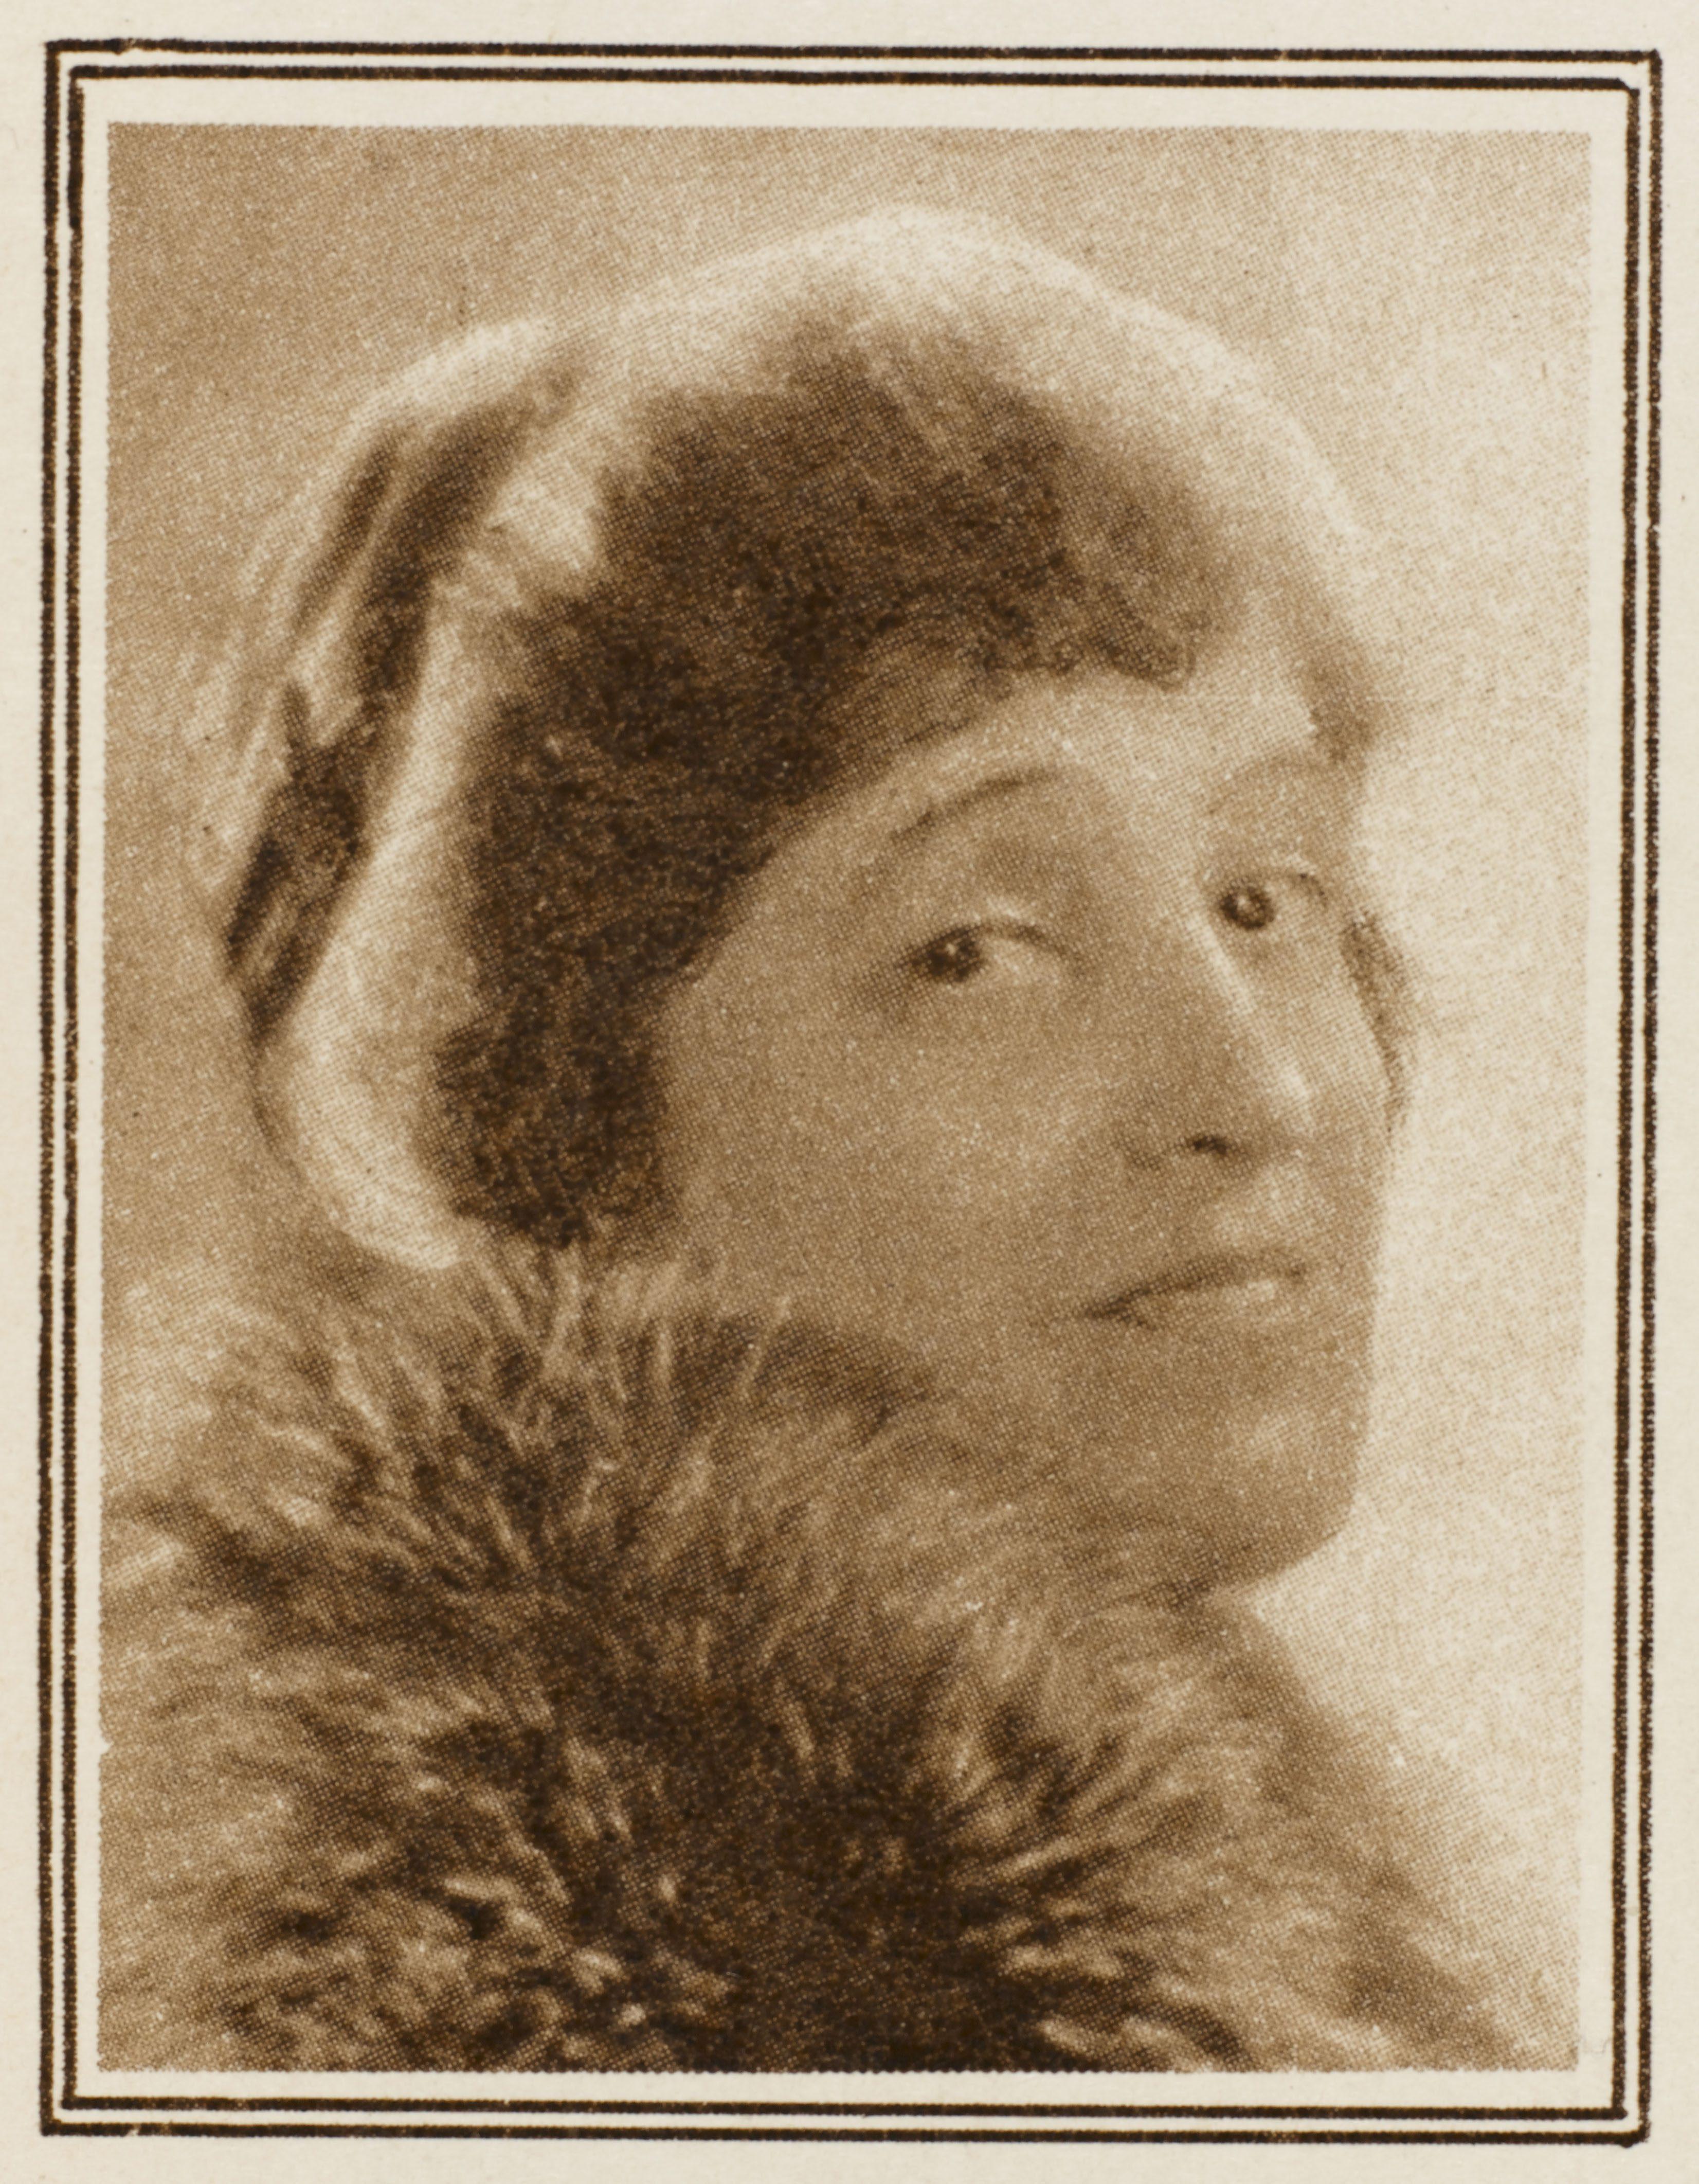 Edith Newbold Wharton Nee Jones American Novelist 1862 - 1937